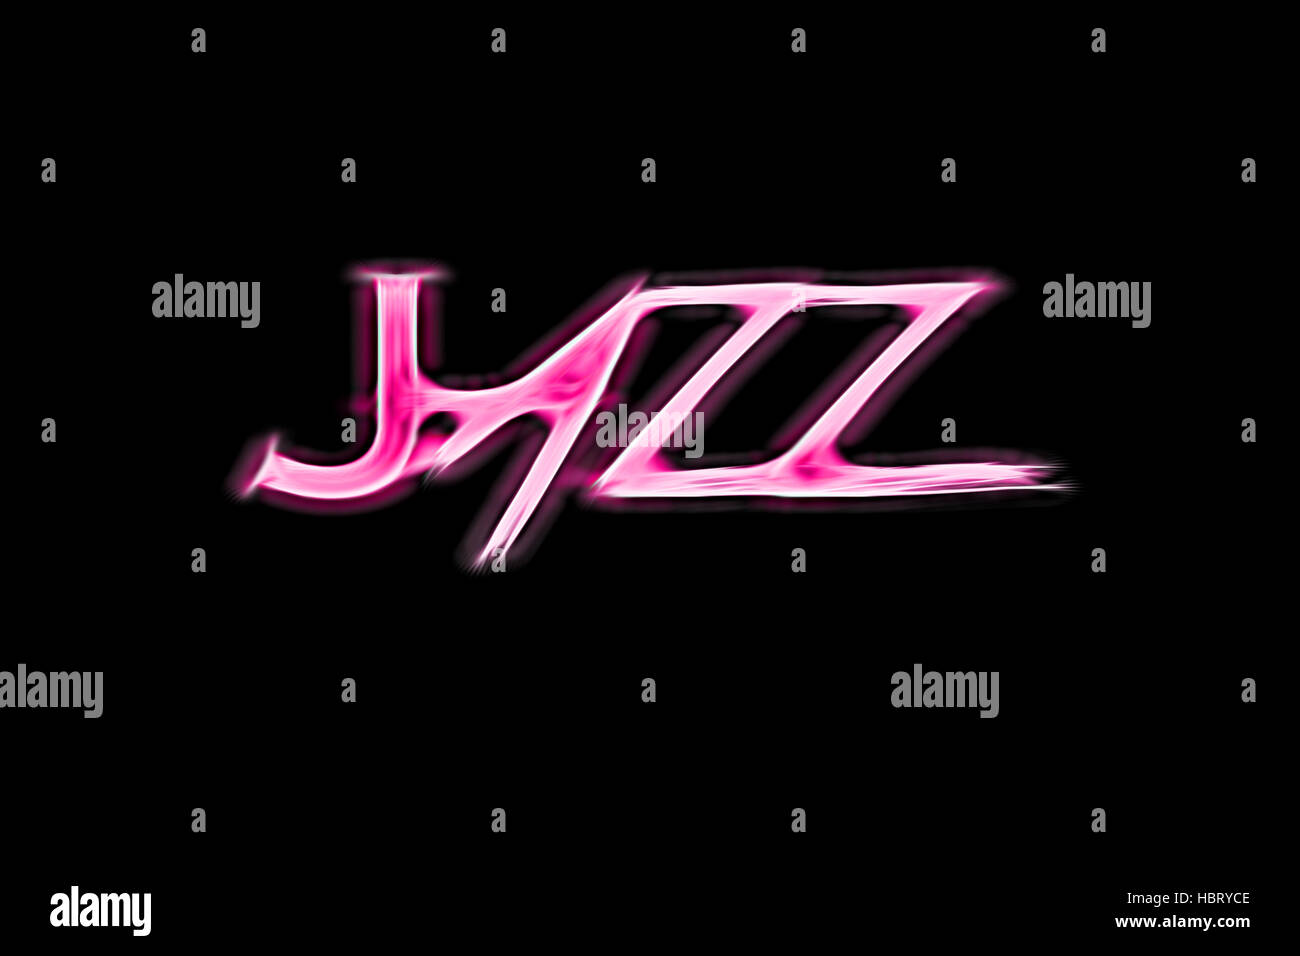 Jazz - Stock Image